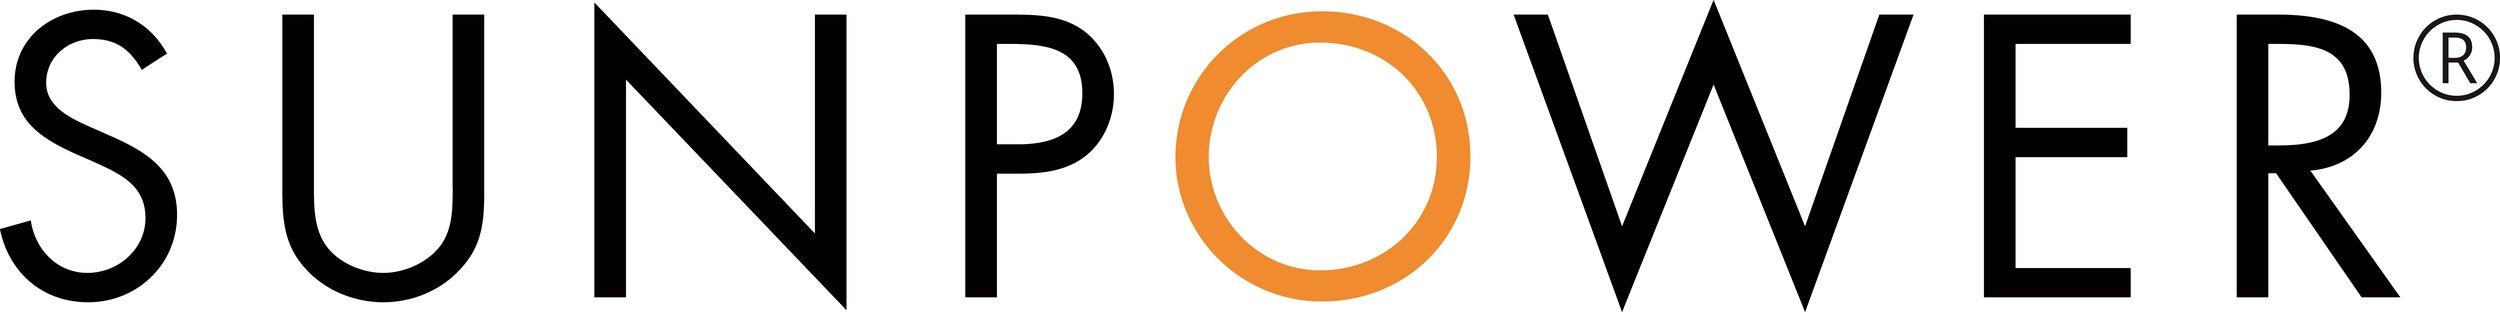 sp_2014_logo_black_orange_rgb_1200_152.jpg